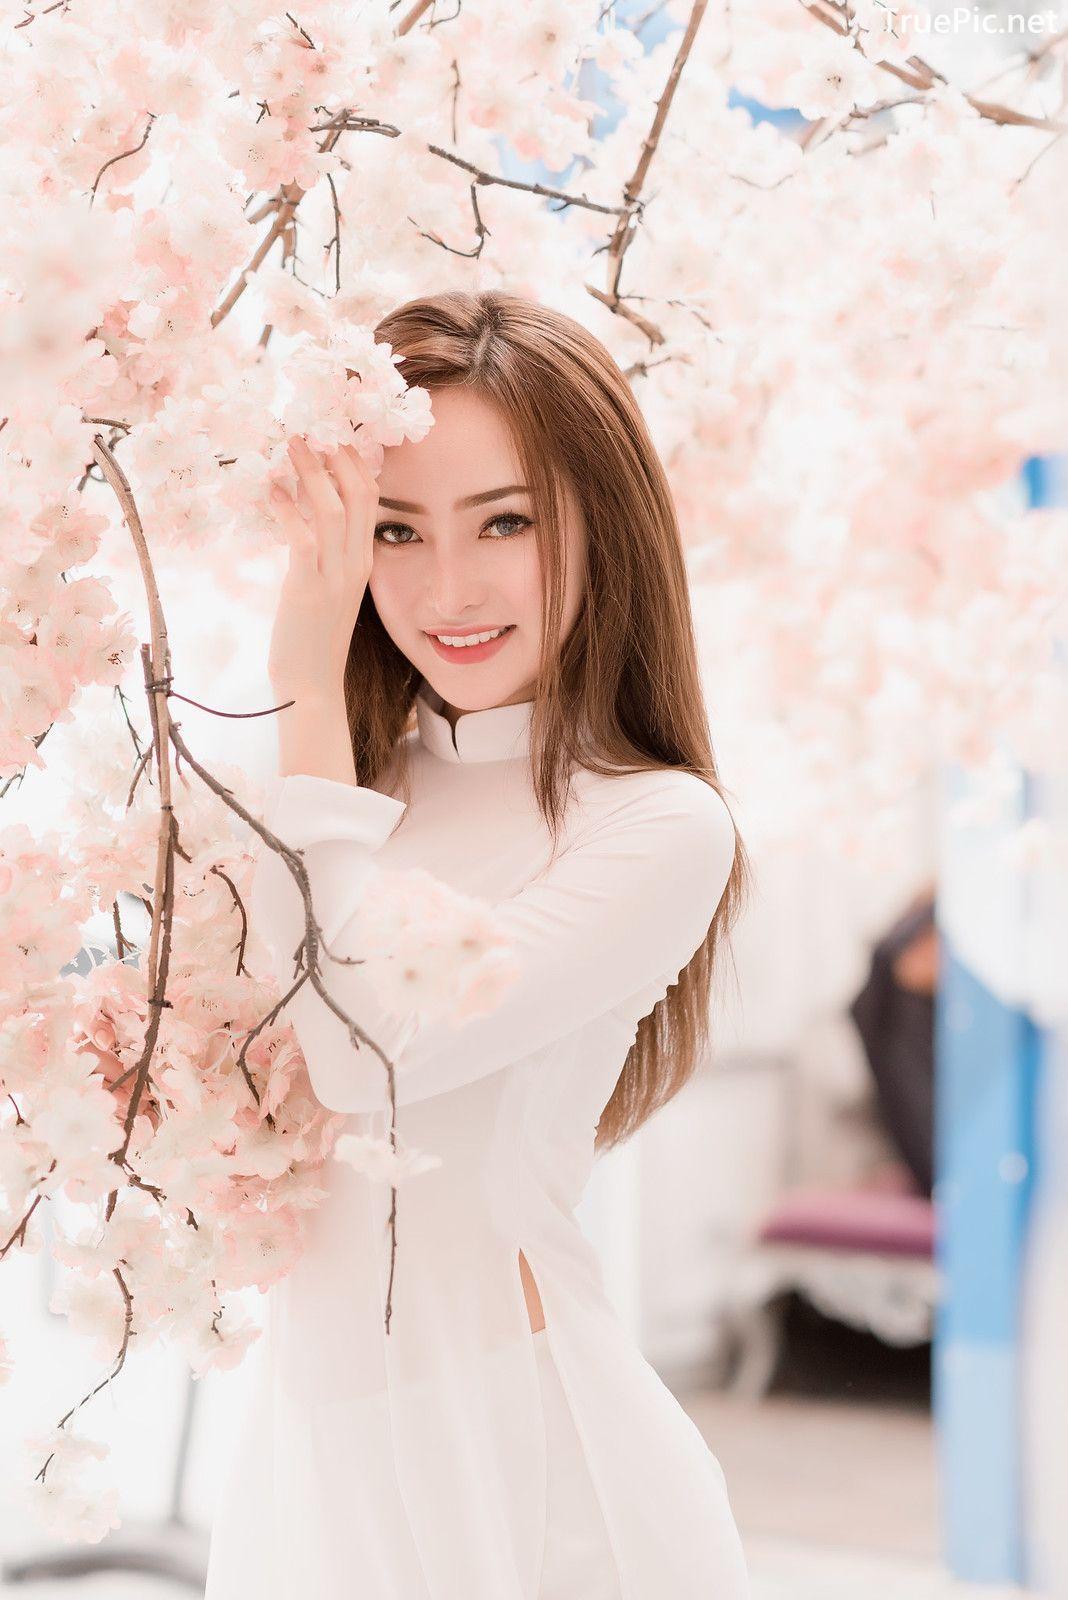 Image-Vietnamese-Beautiful-Girl-Ao-Dai-Vietnam-Traditional-Dress-by-VIN-Photo-2-TruePic.net- Picture-1